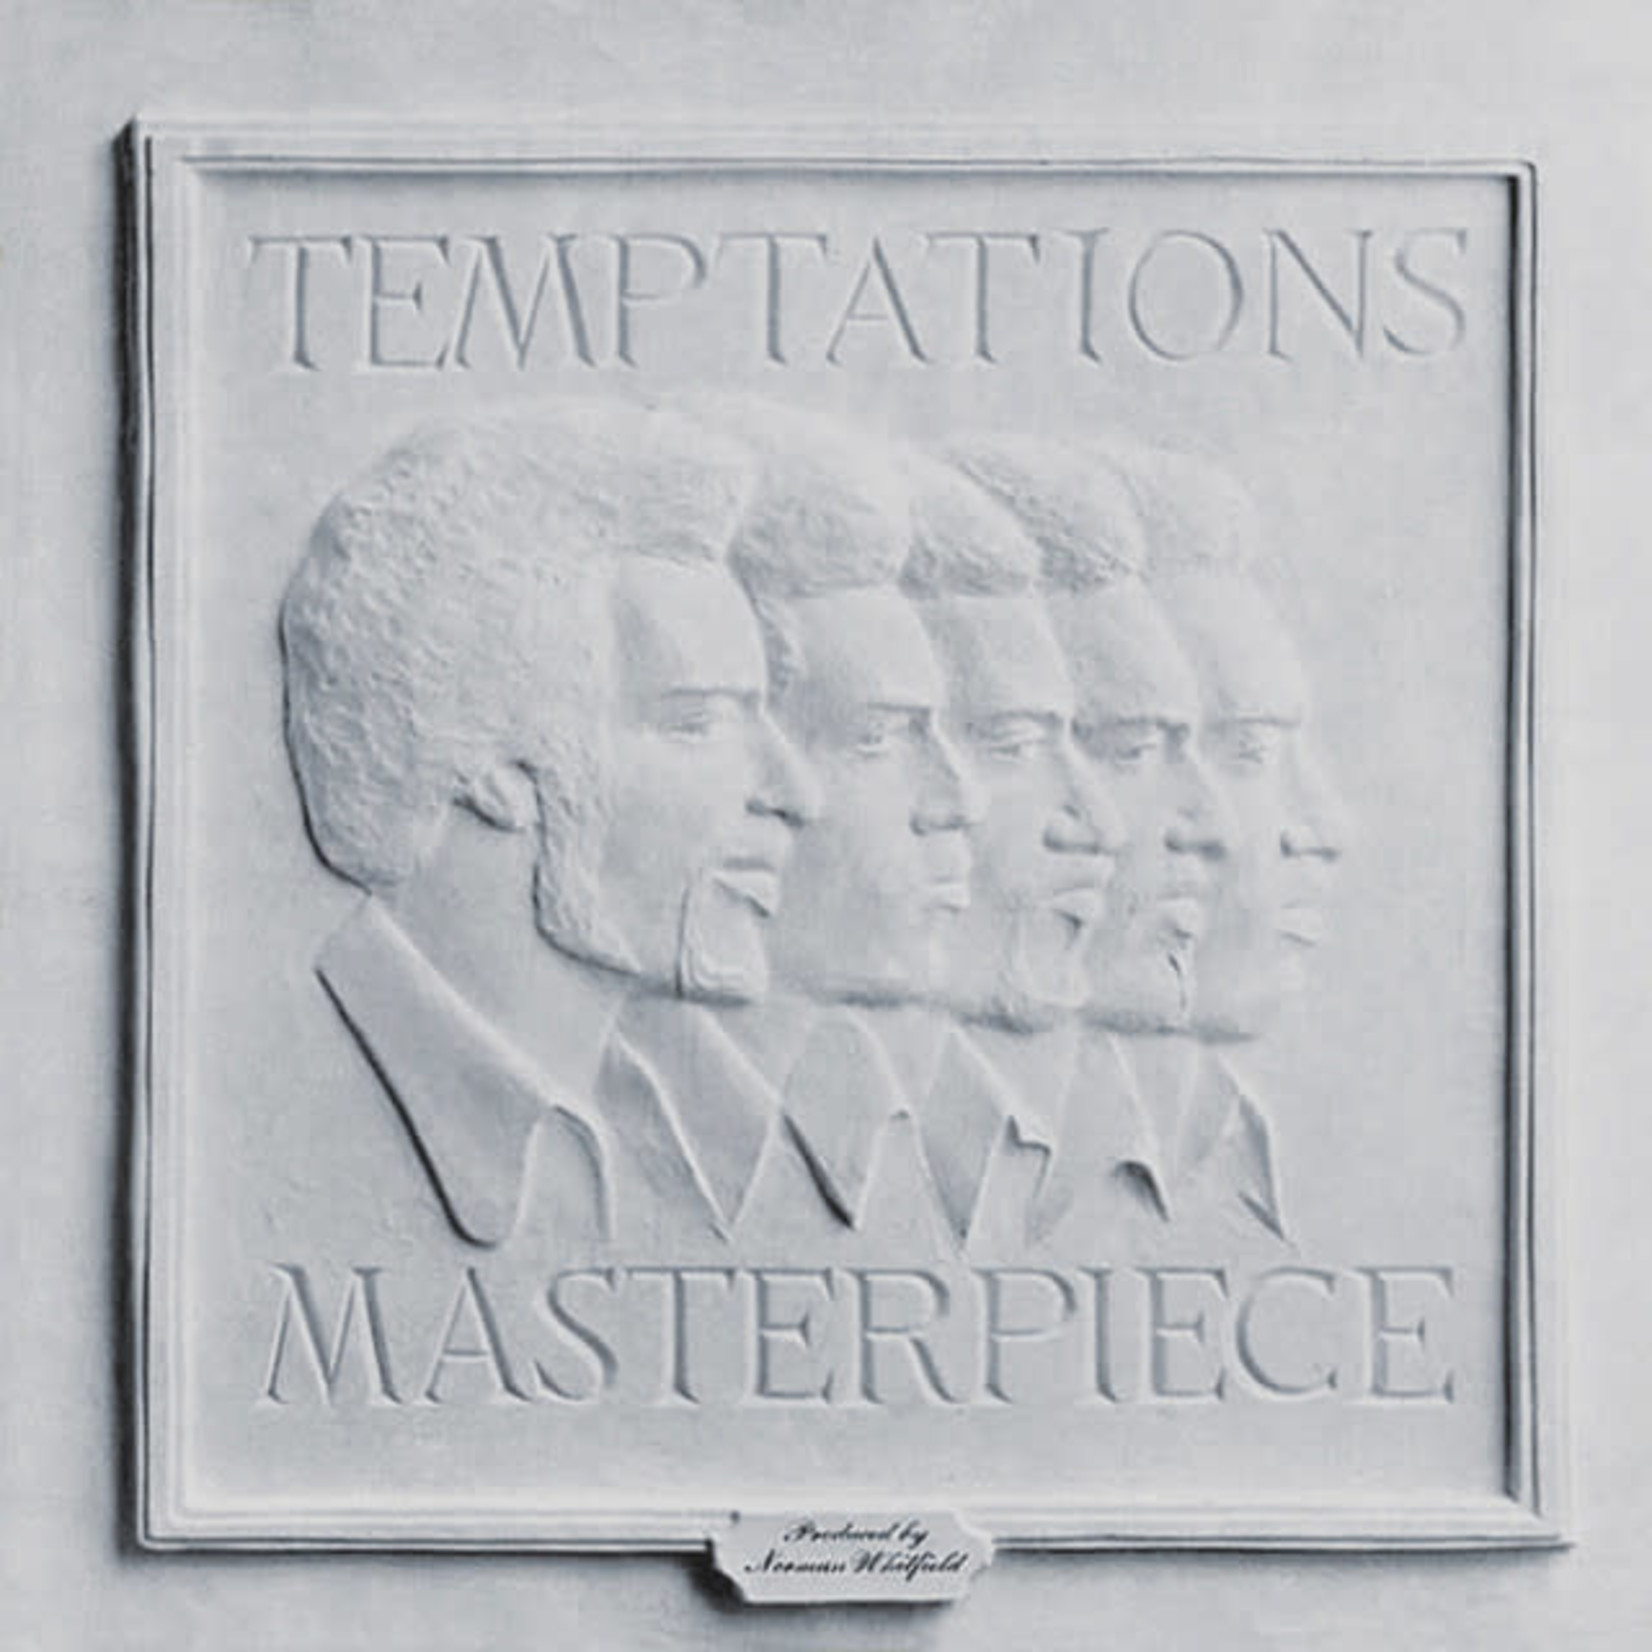 Vinyl Temptations - Masterpiece